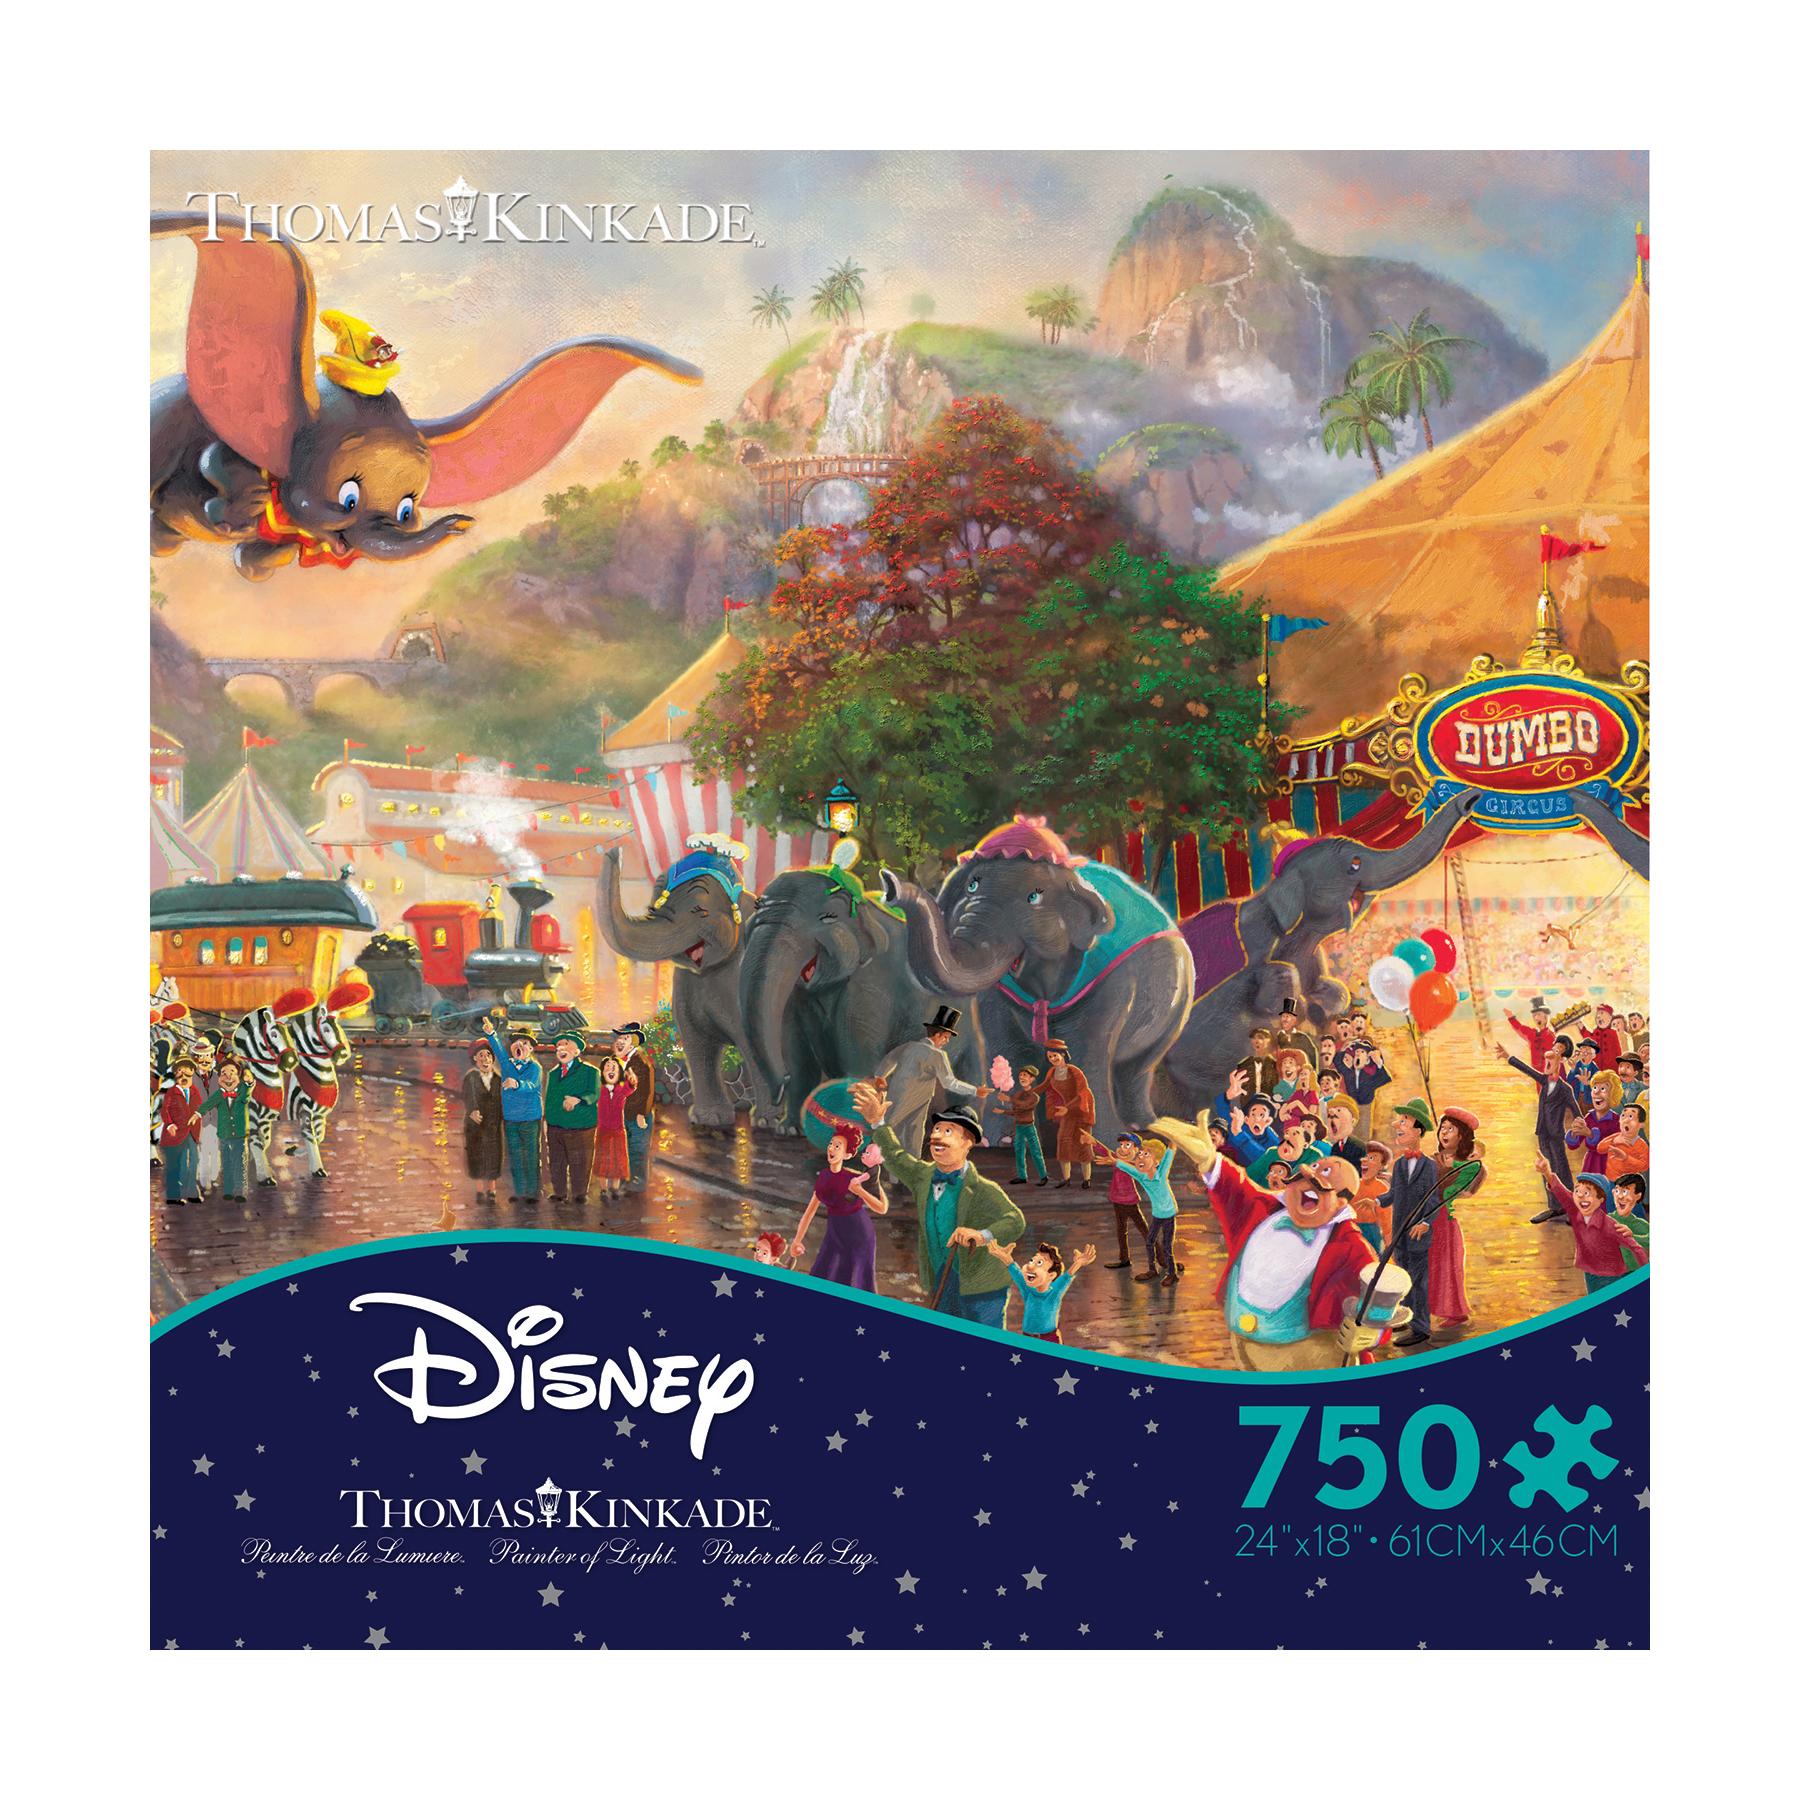 Thomas Kinkade Disney Dreams - Disney Dumbo: 750 Pcs